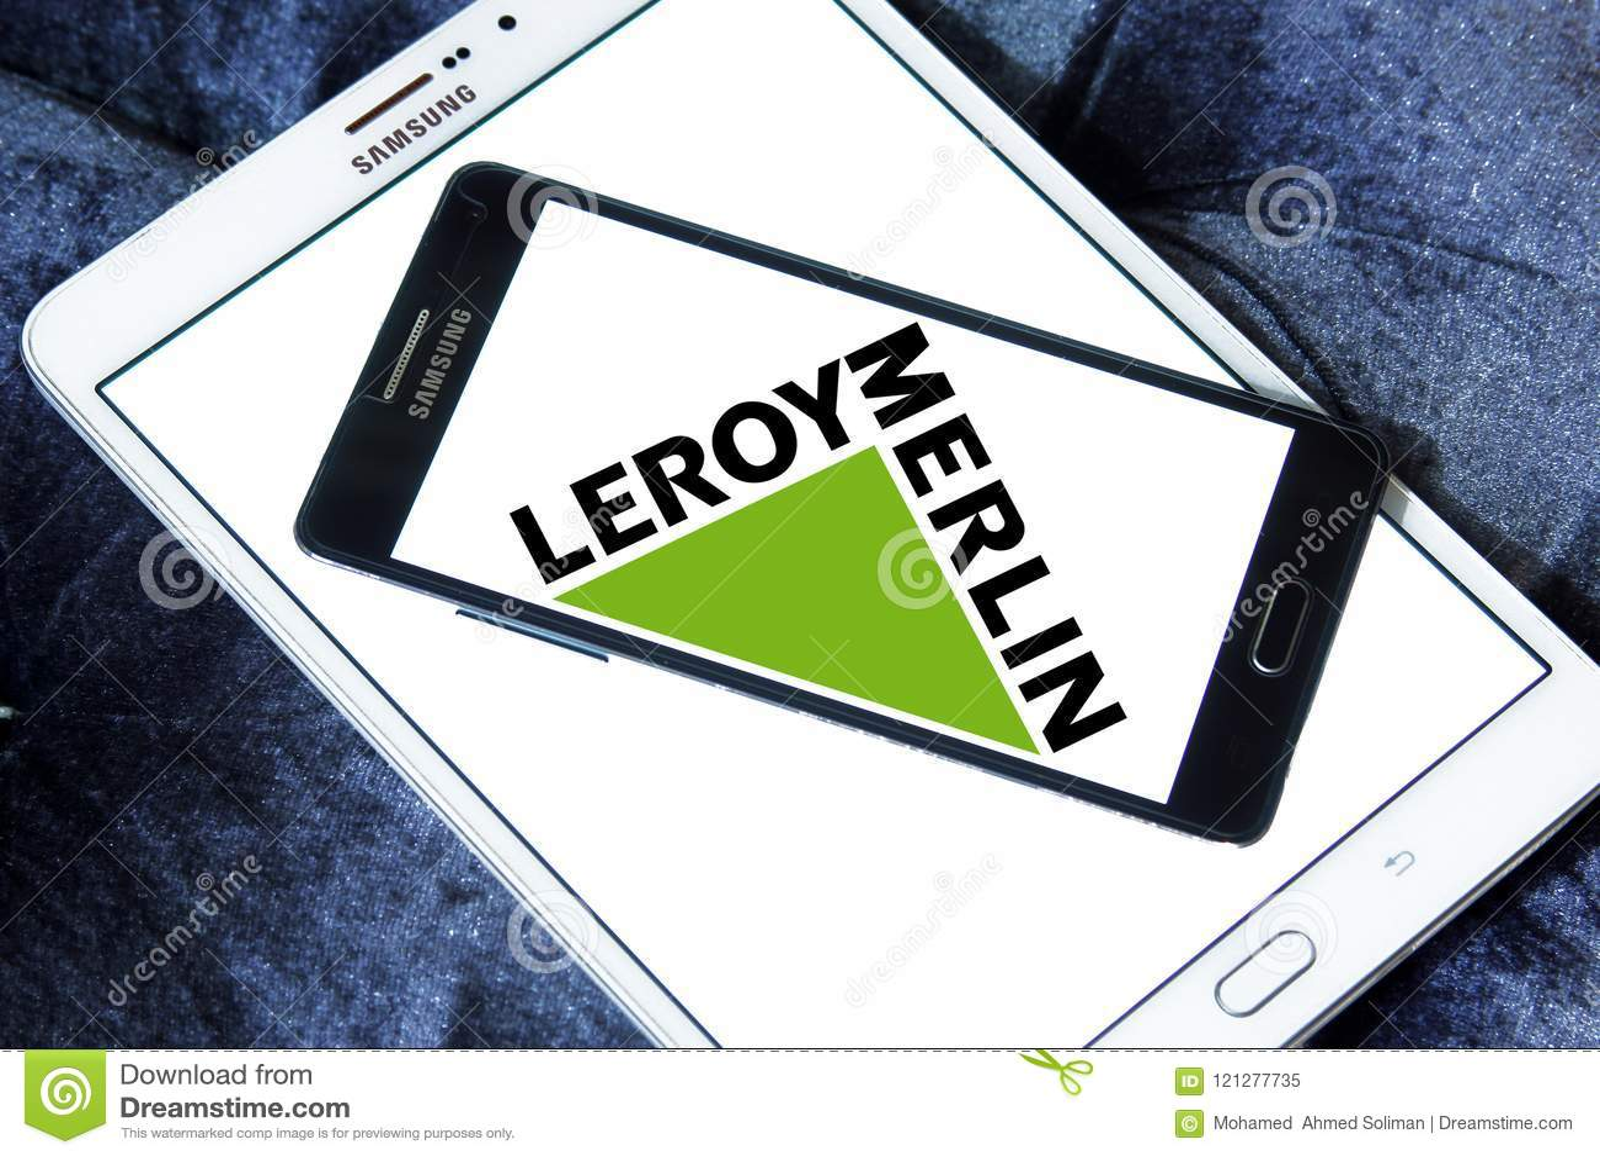 Leroy merlin opens new store near bucharest business review